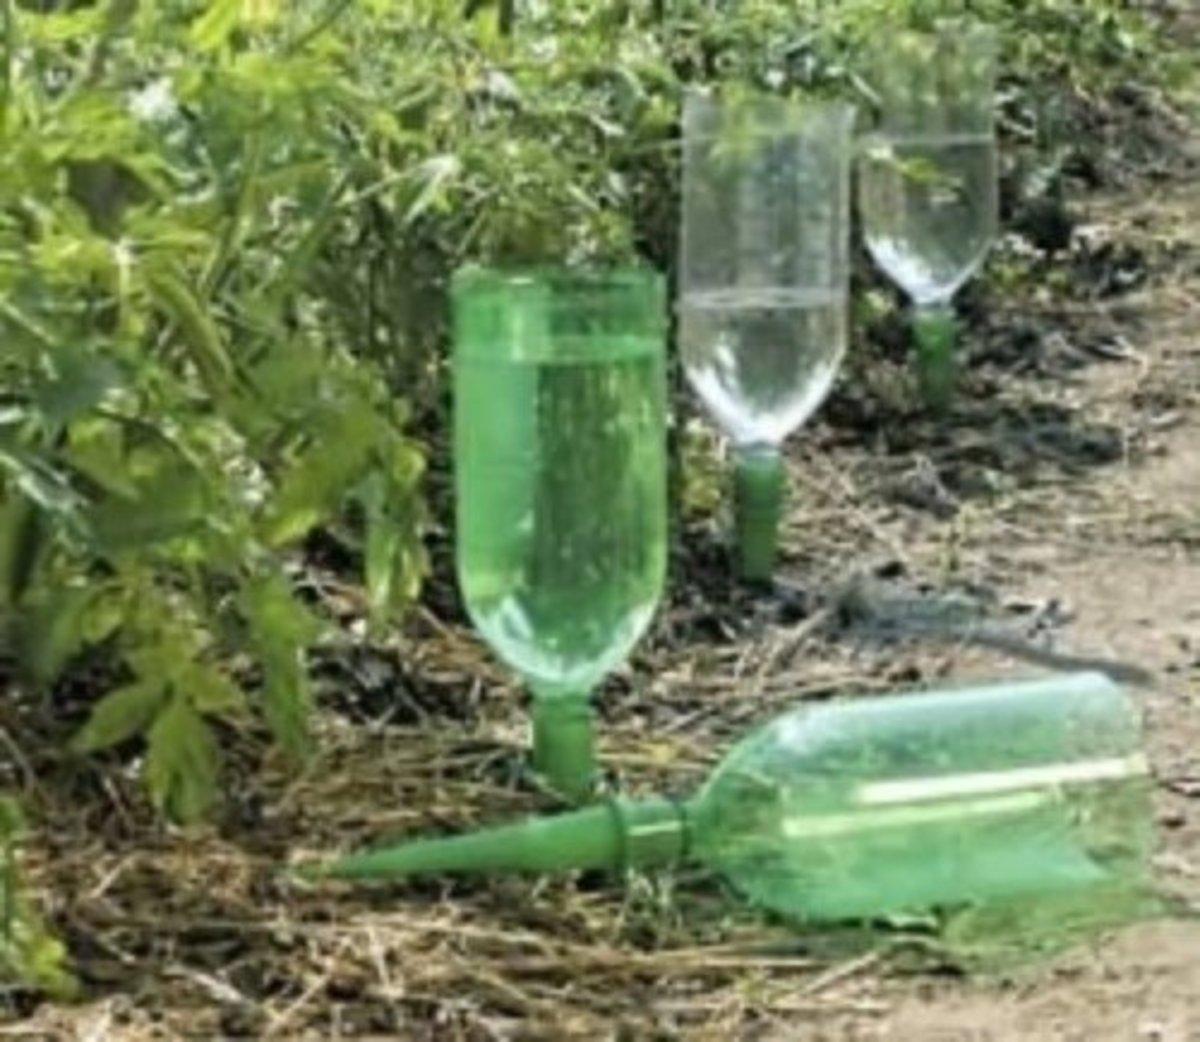 reuseplasticbottles